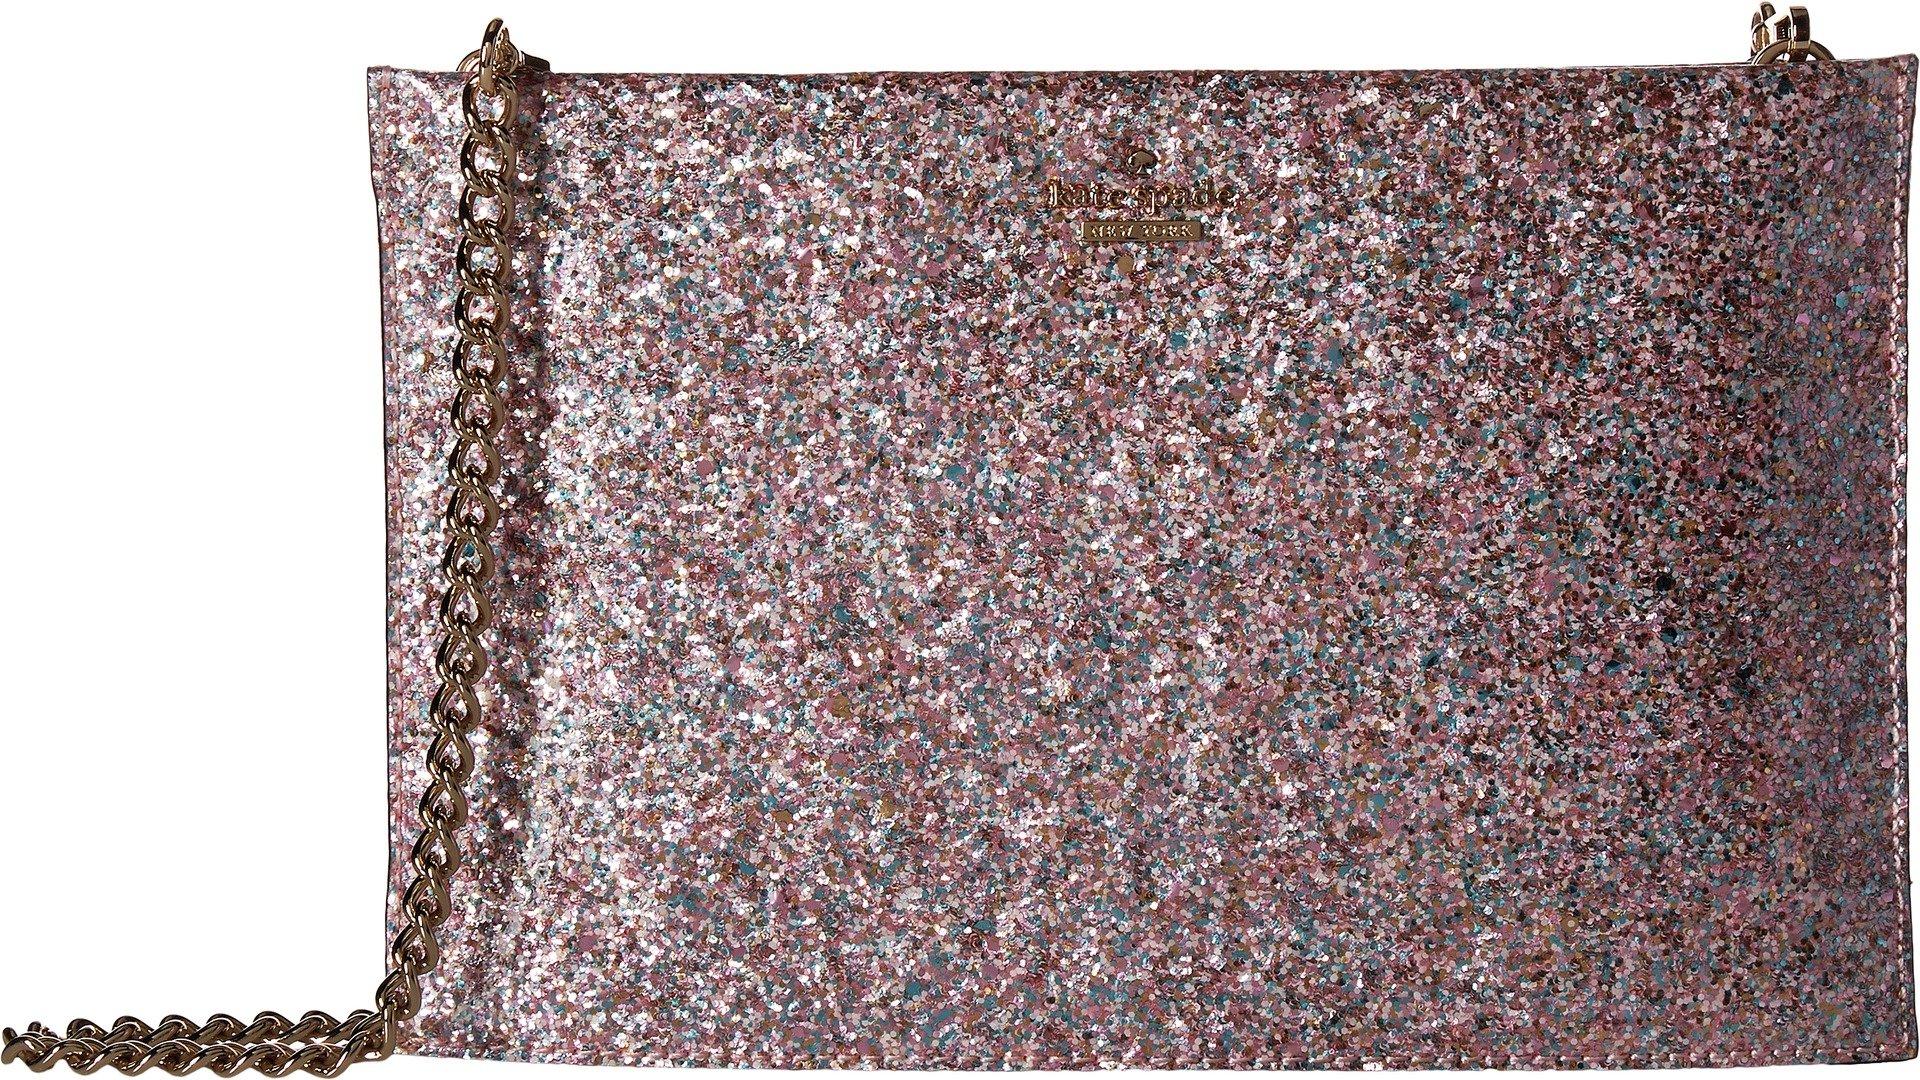 Kate Spade New York Women's Wedding Belles Glitterbug Sima Pastel Multi Handbag by Kate Spade New York